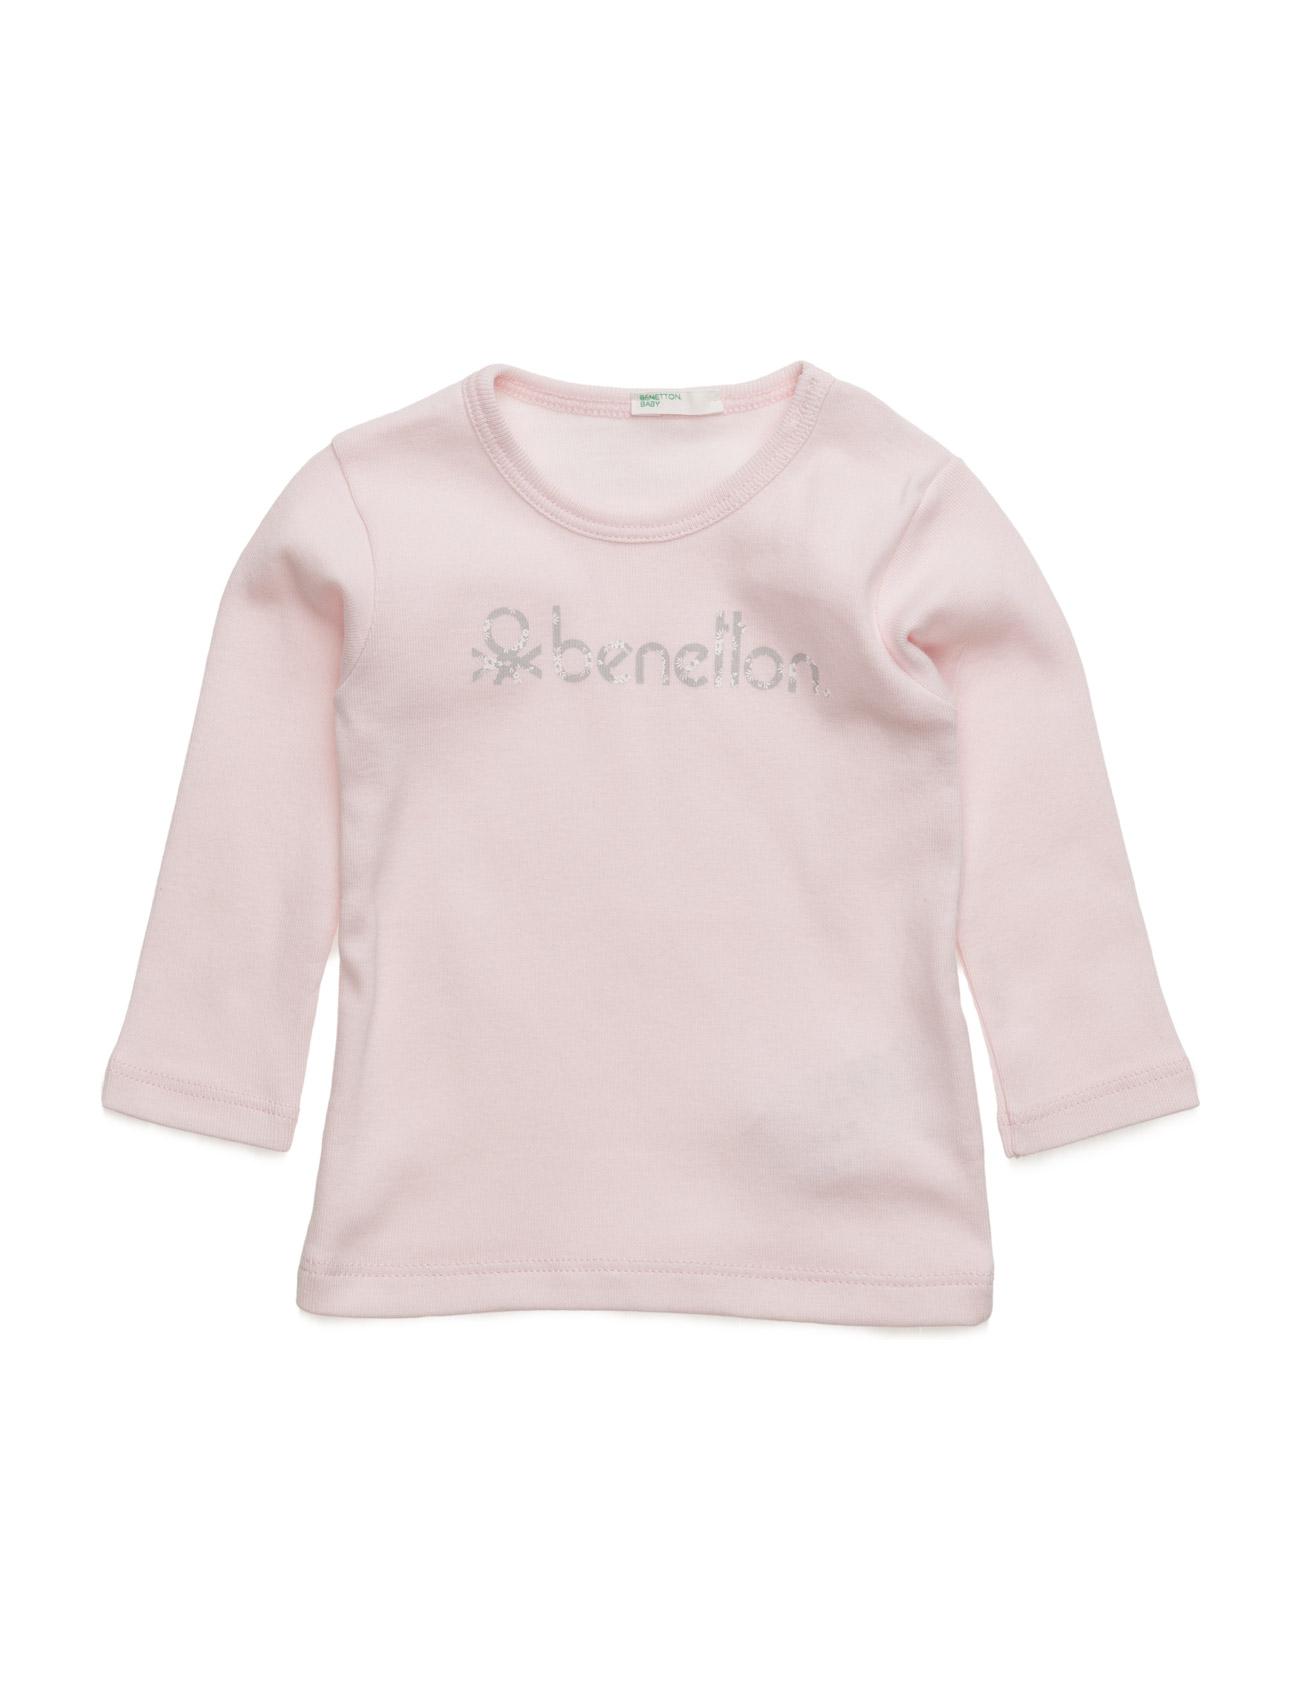 T-Shirt L/S United Colors of Benetton T-shirts til Piger i Pale Pink